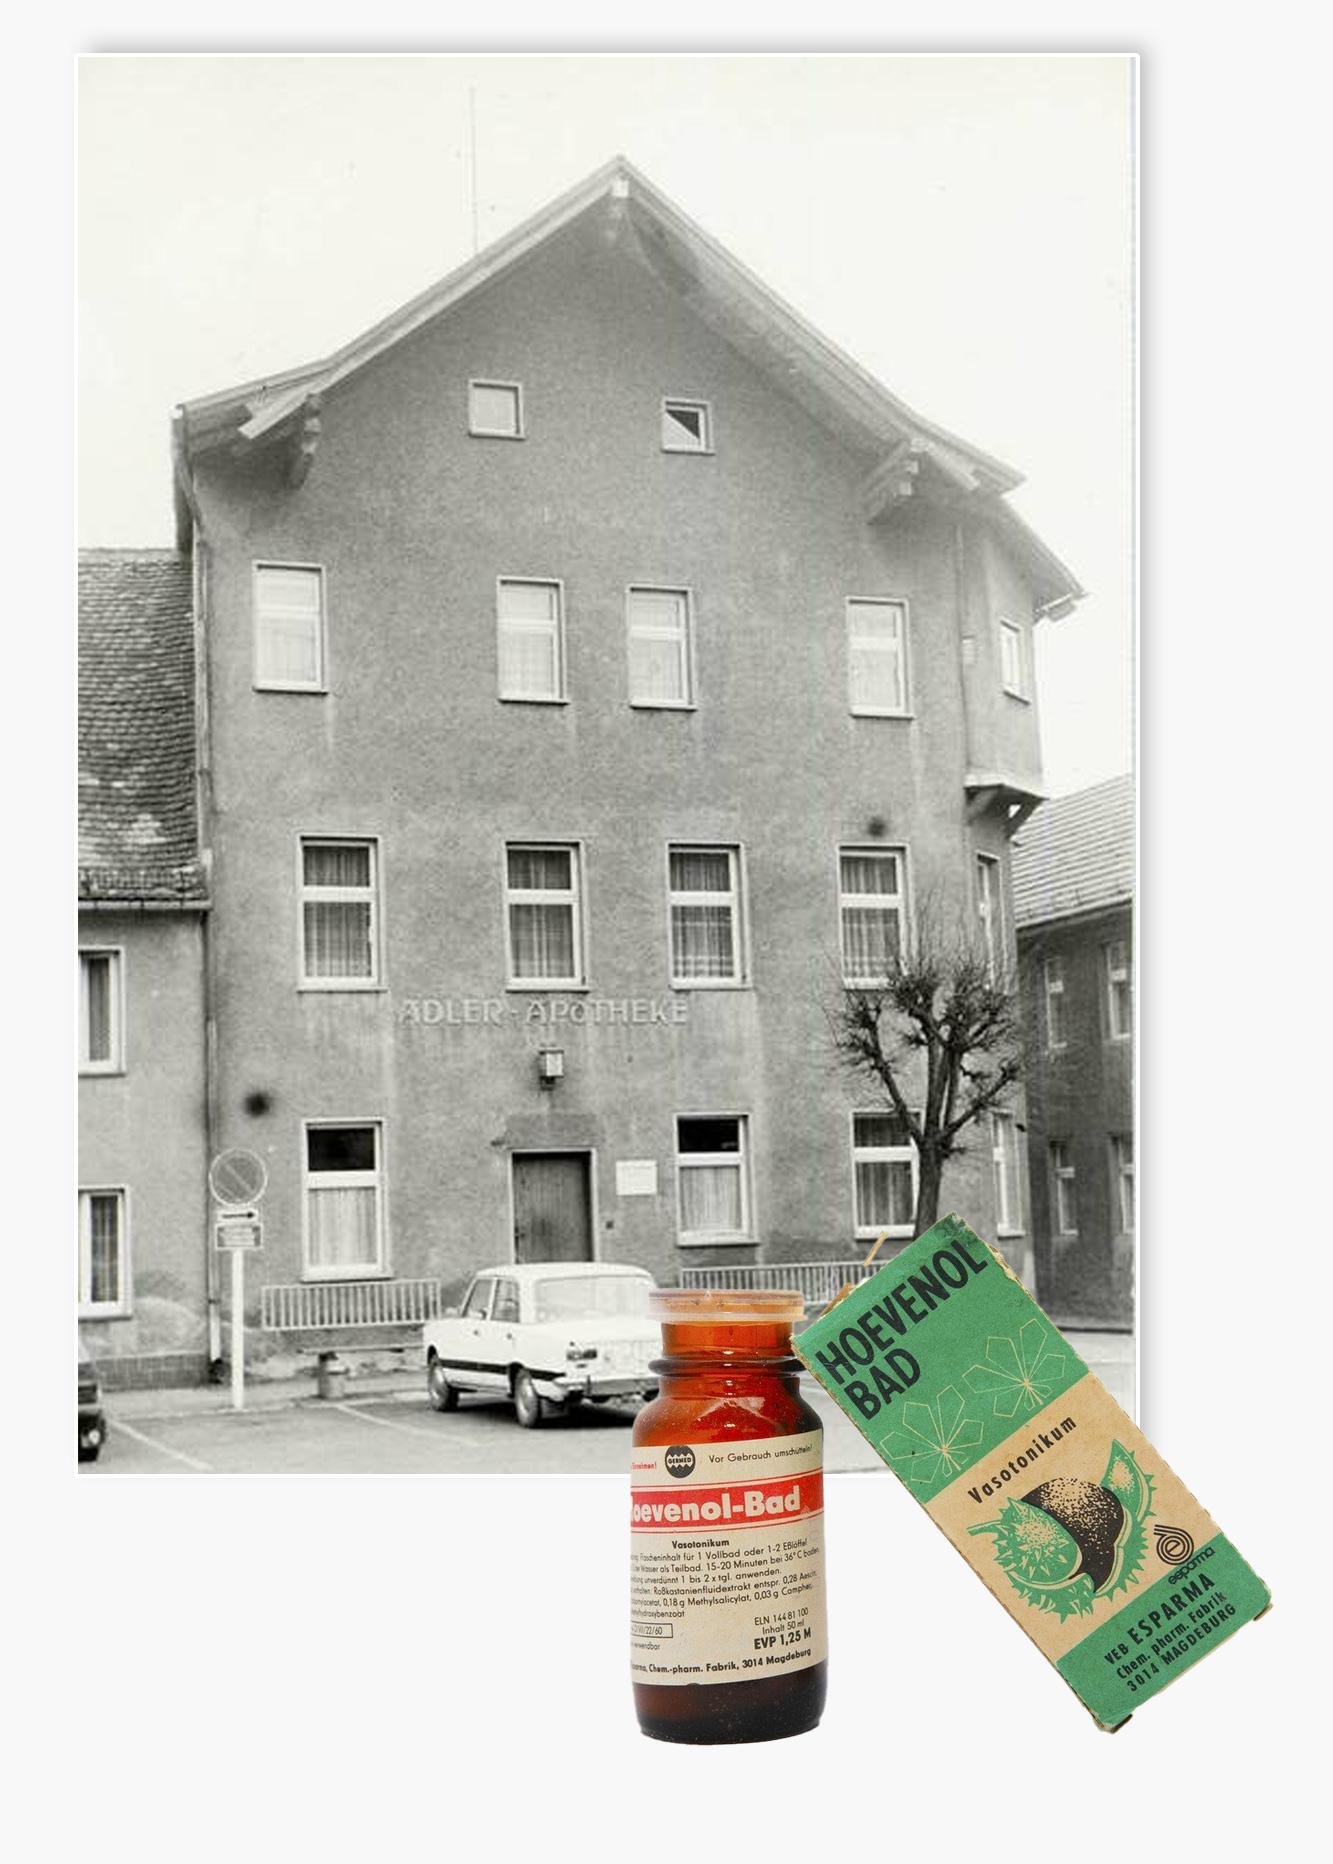 Adler-Apotheke Wittichenau